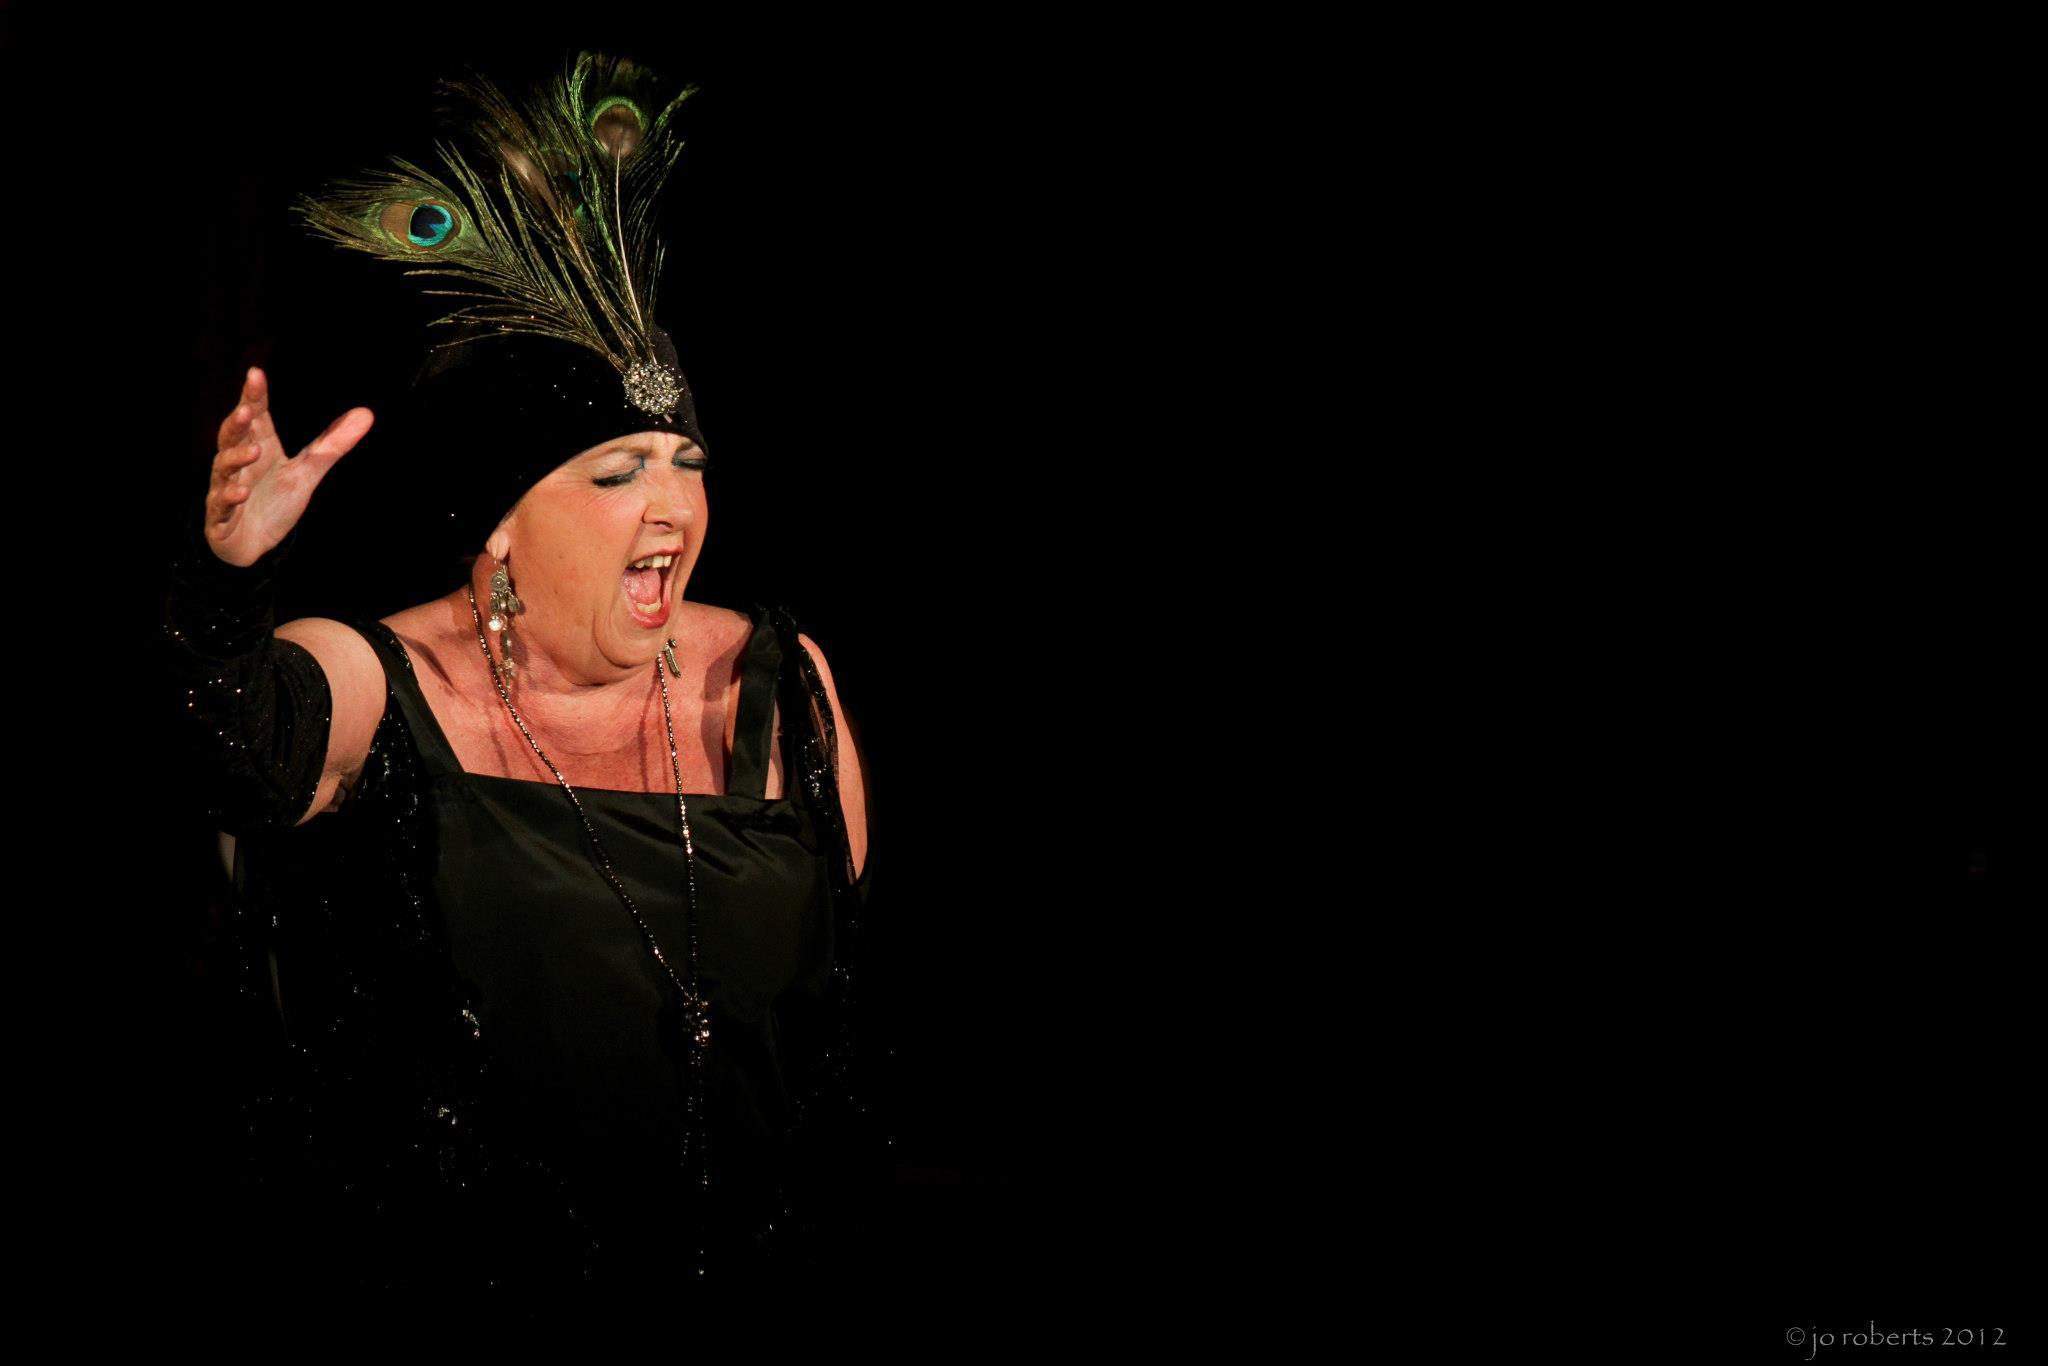 Nola Wallace_Wild Party, Lizotte's 2012